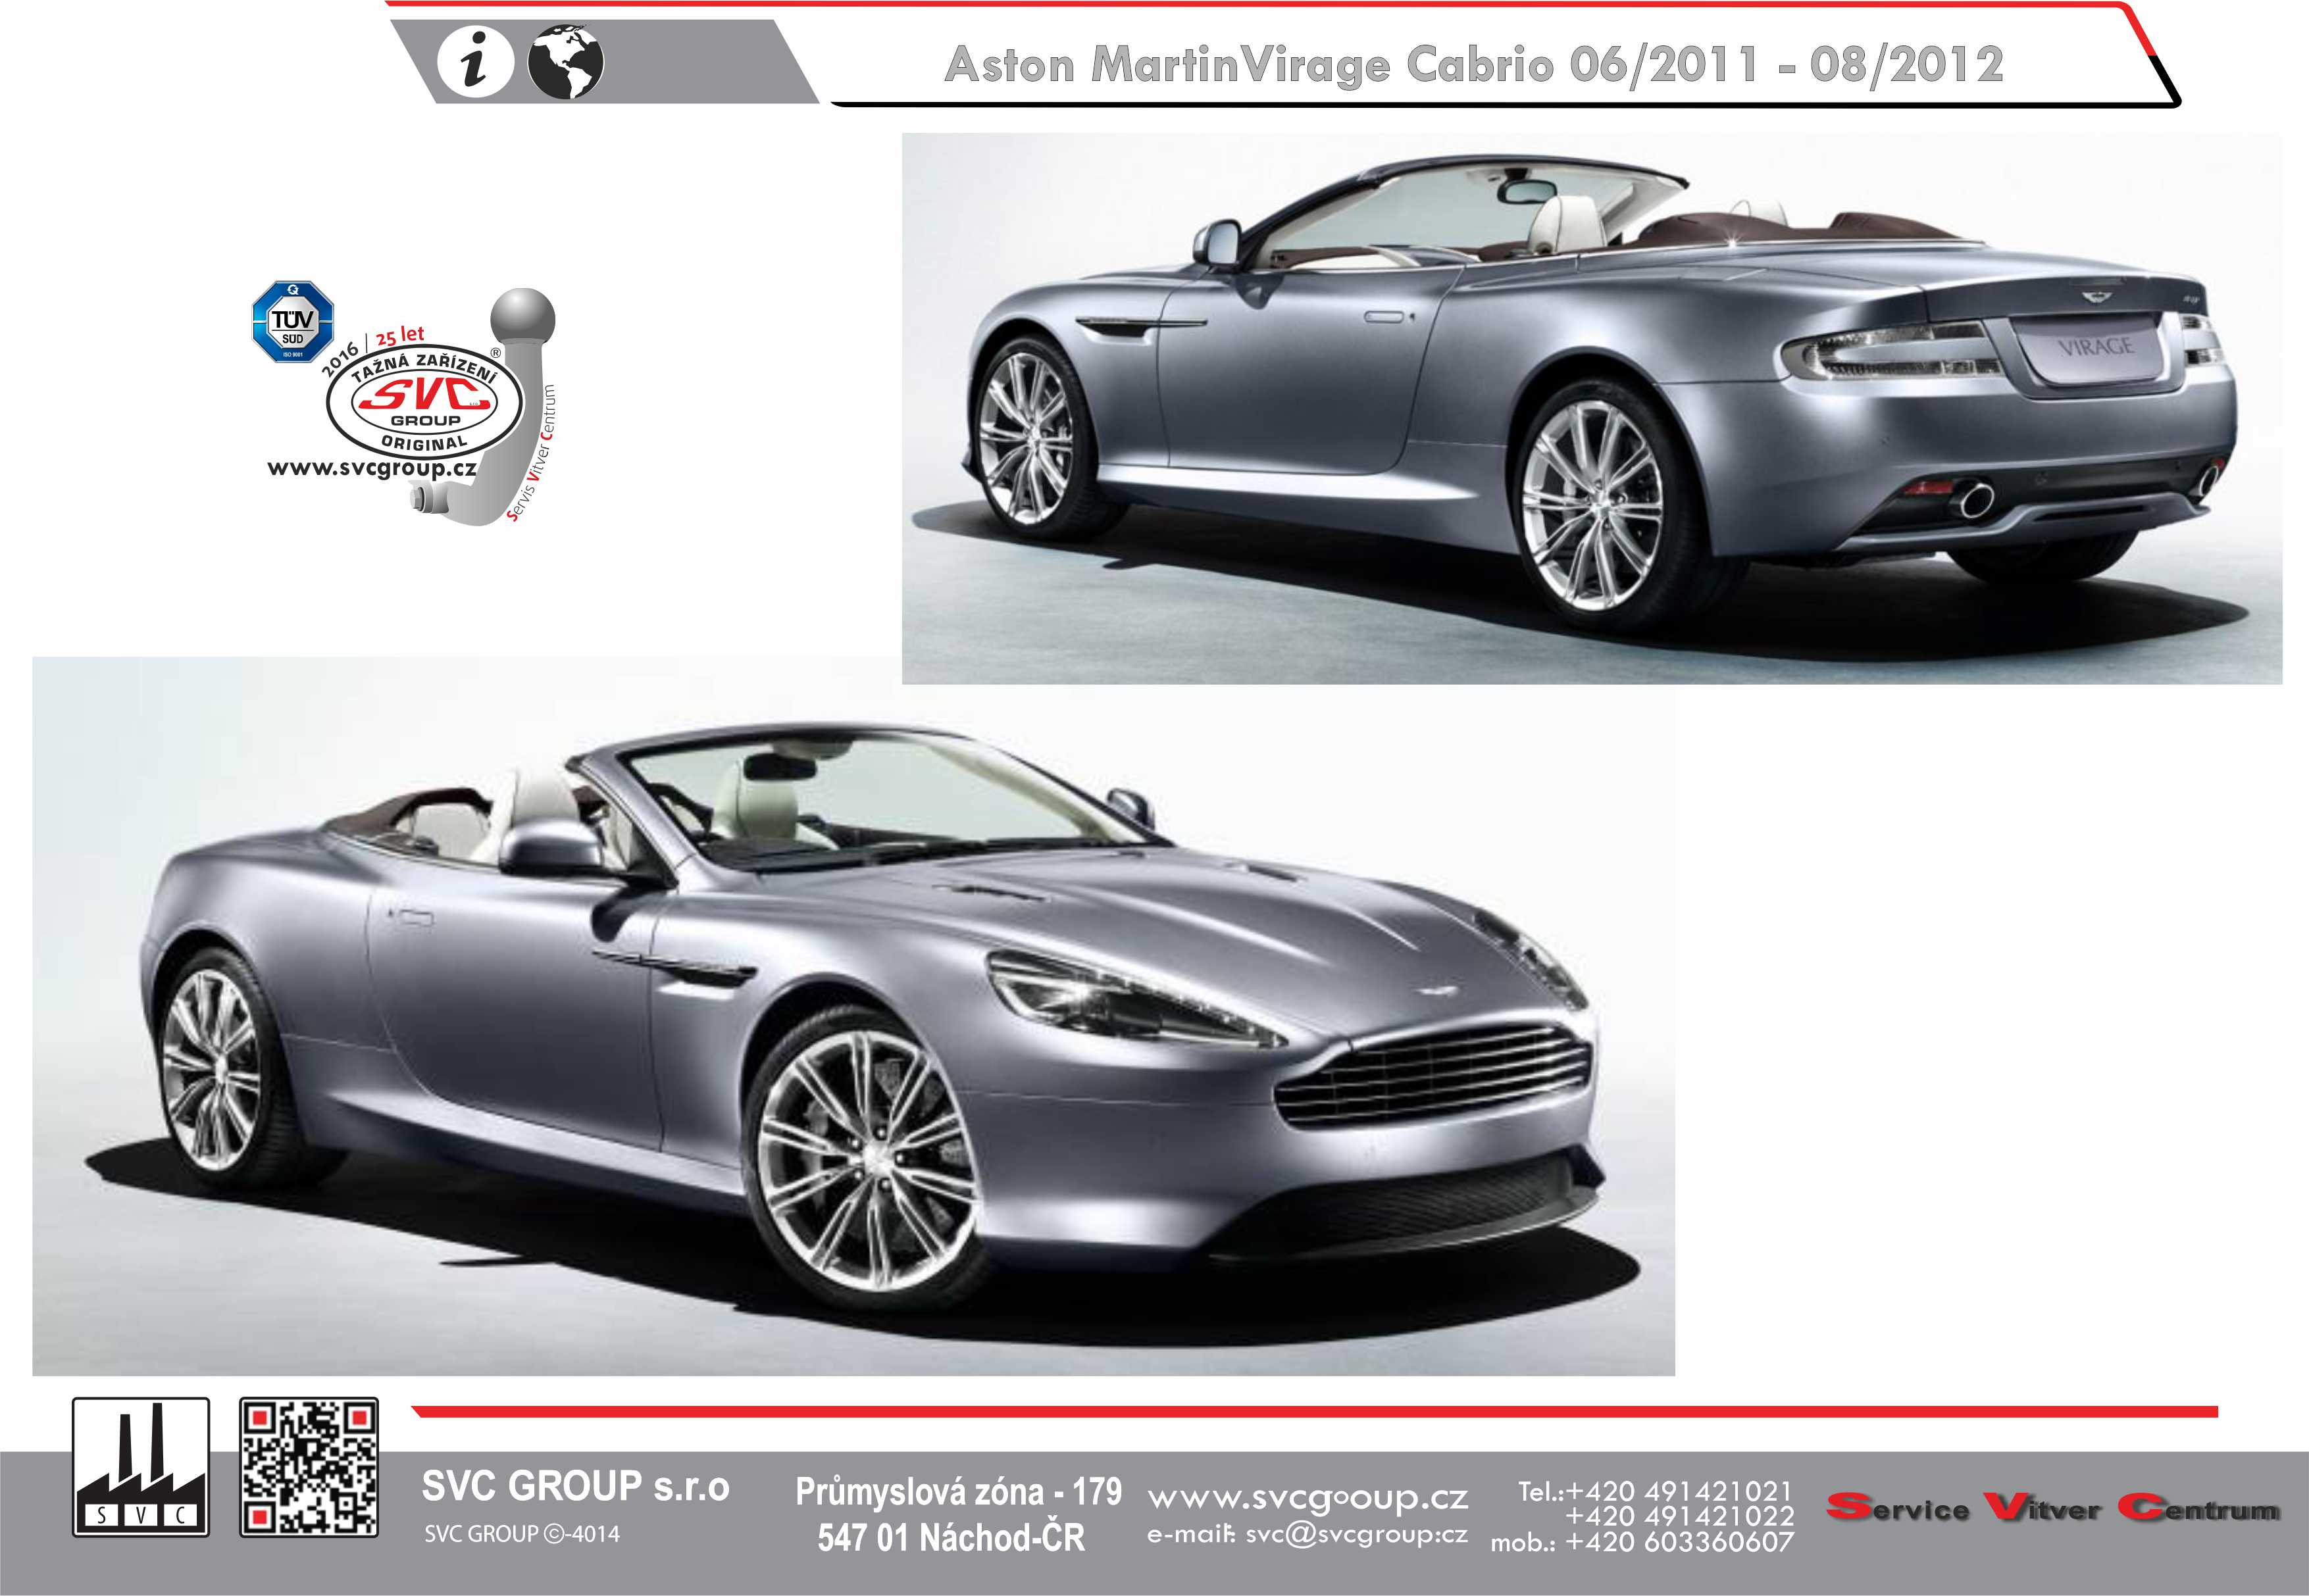 Aston Martin Virage Cabrio